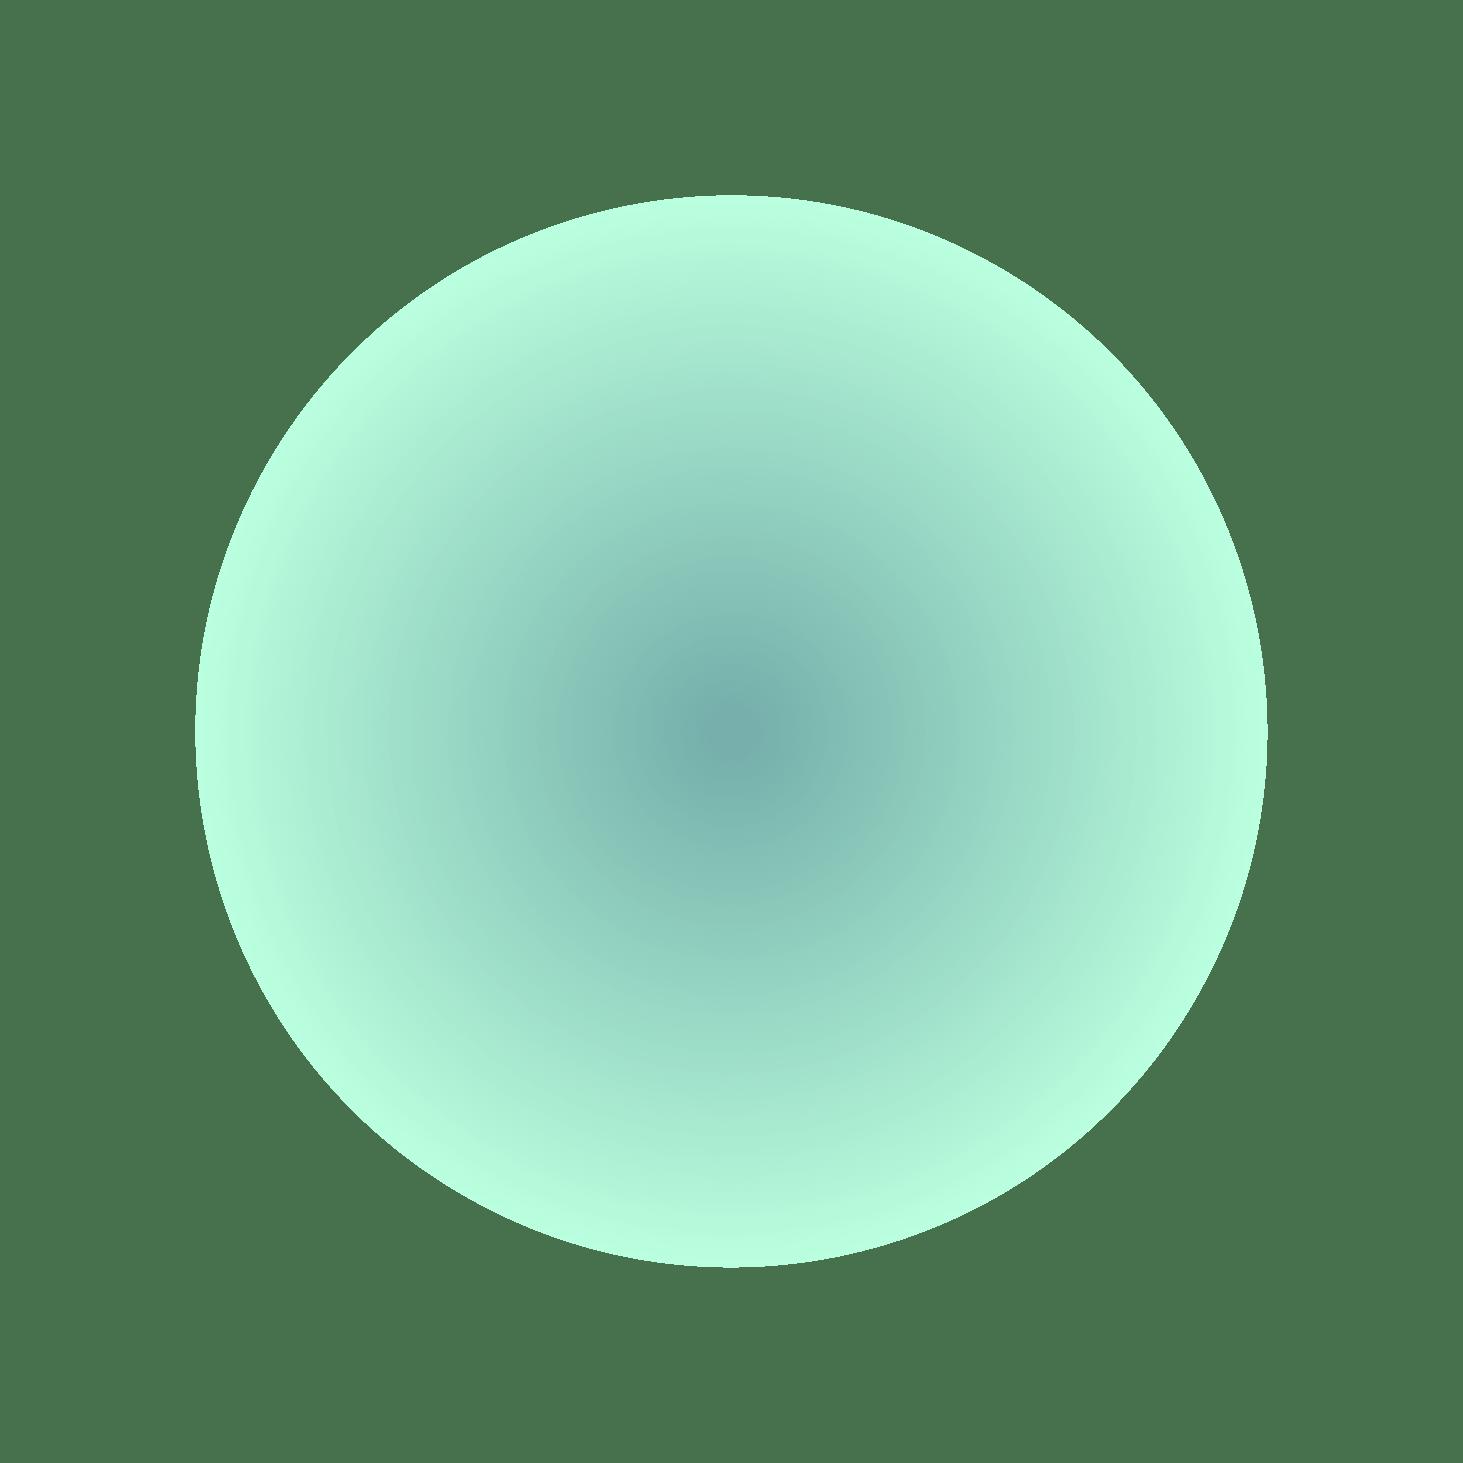 decoration-ellipse